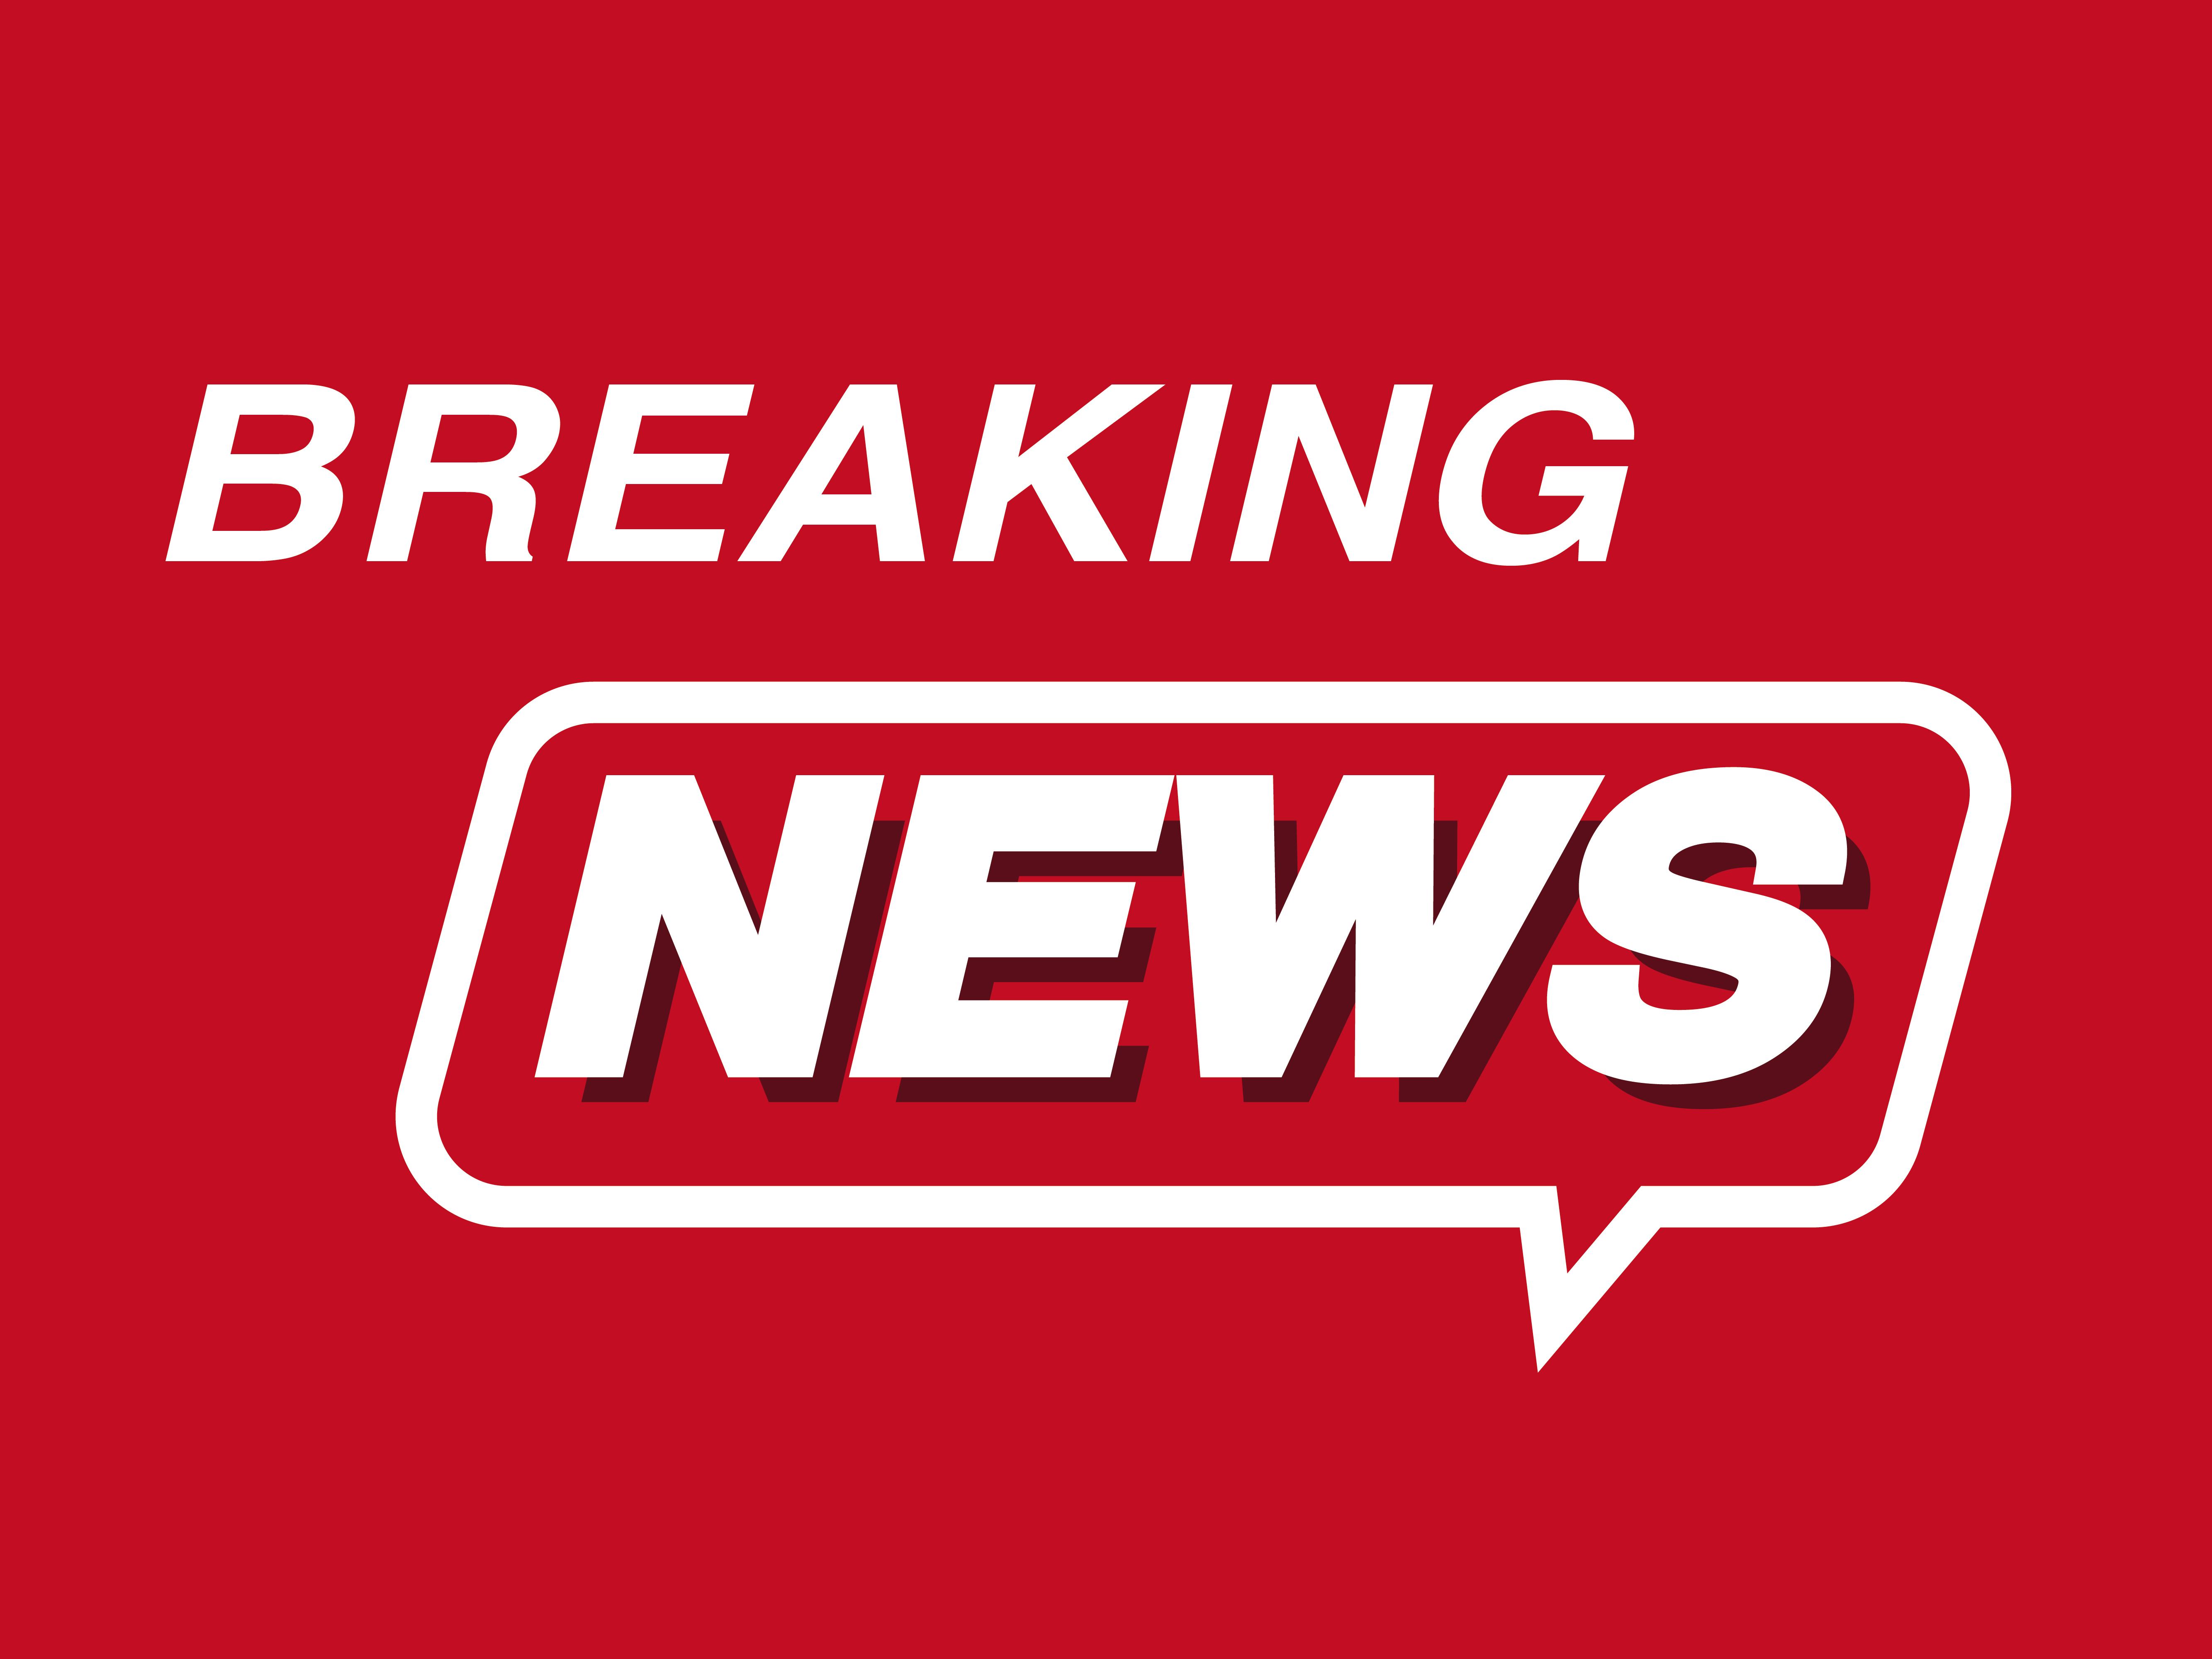 5.1-magnitude quake hits 59 km east of Sary-Tash, Kyrgyzstan - USGS